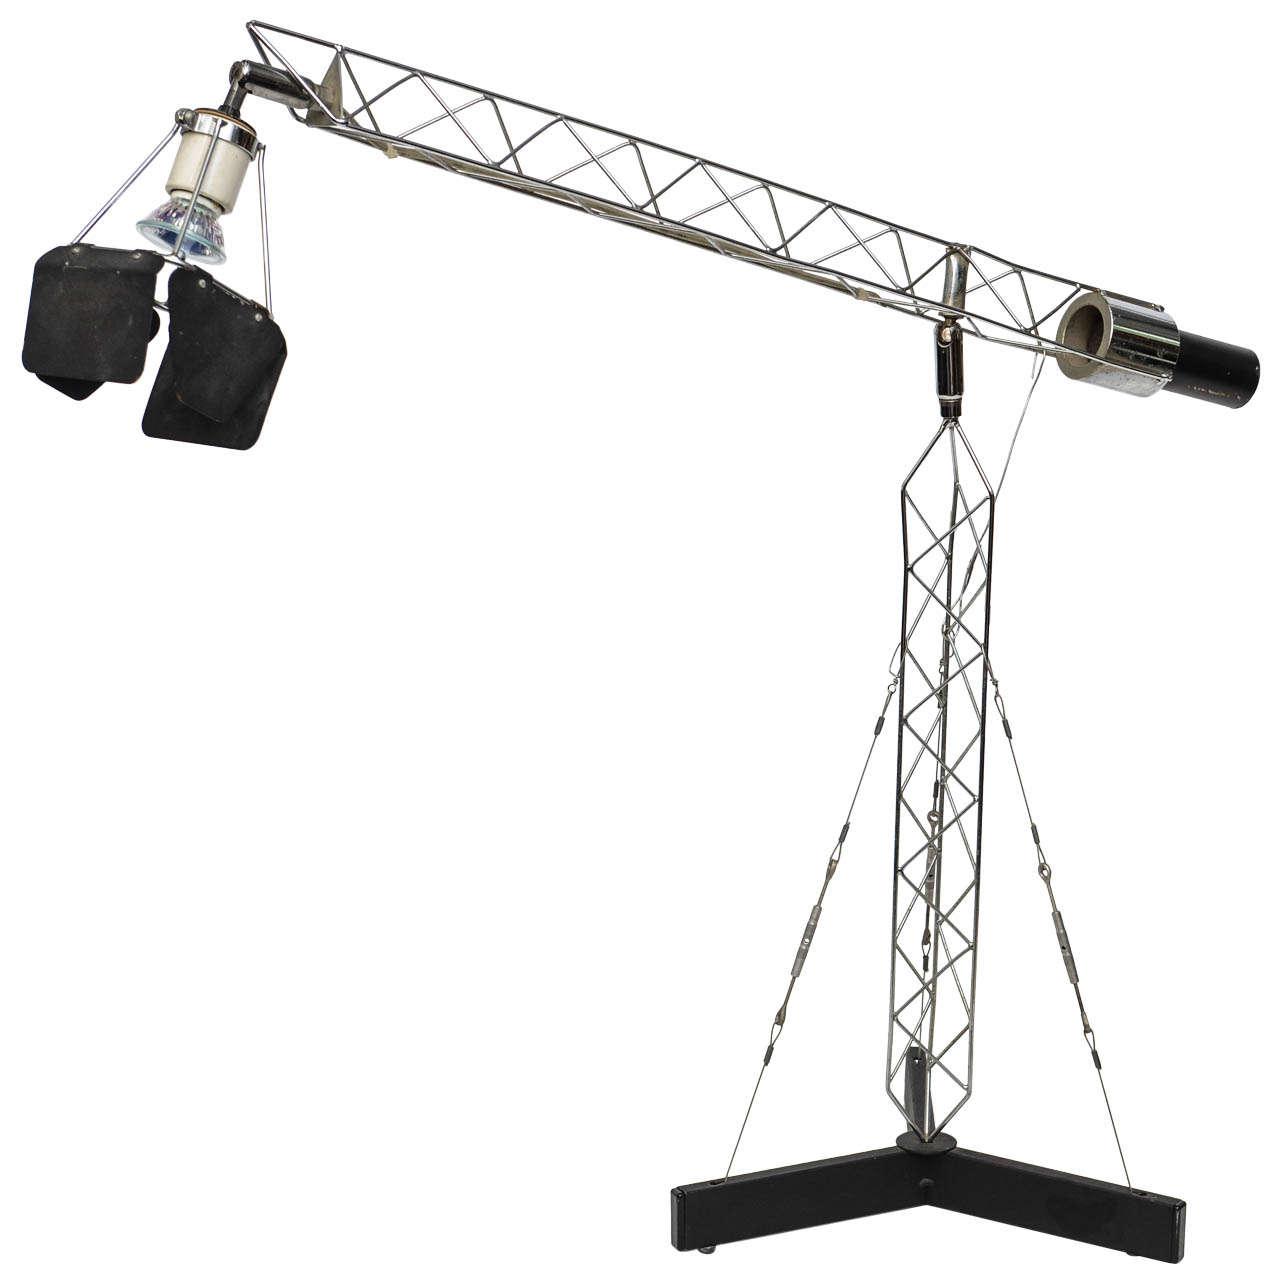 C Jere Vintage Articulating Crane Table Lamp At 1stdibs